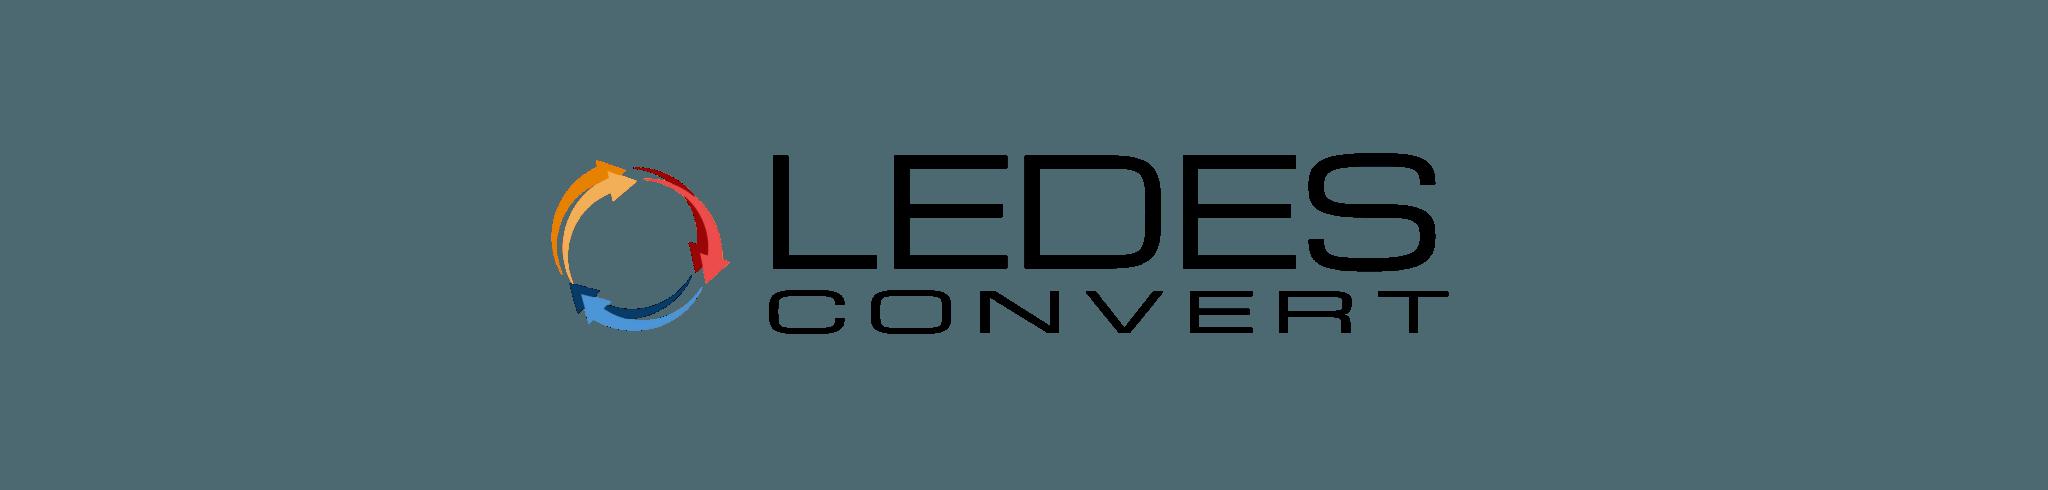 Ledes File Format Converter | Convert Ledes 1998b to Ledes 2000